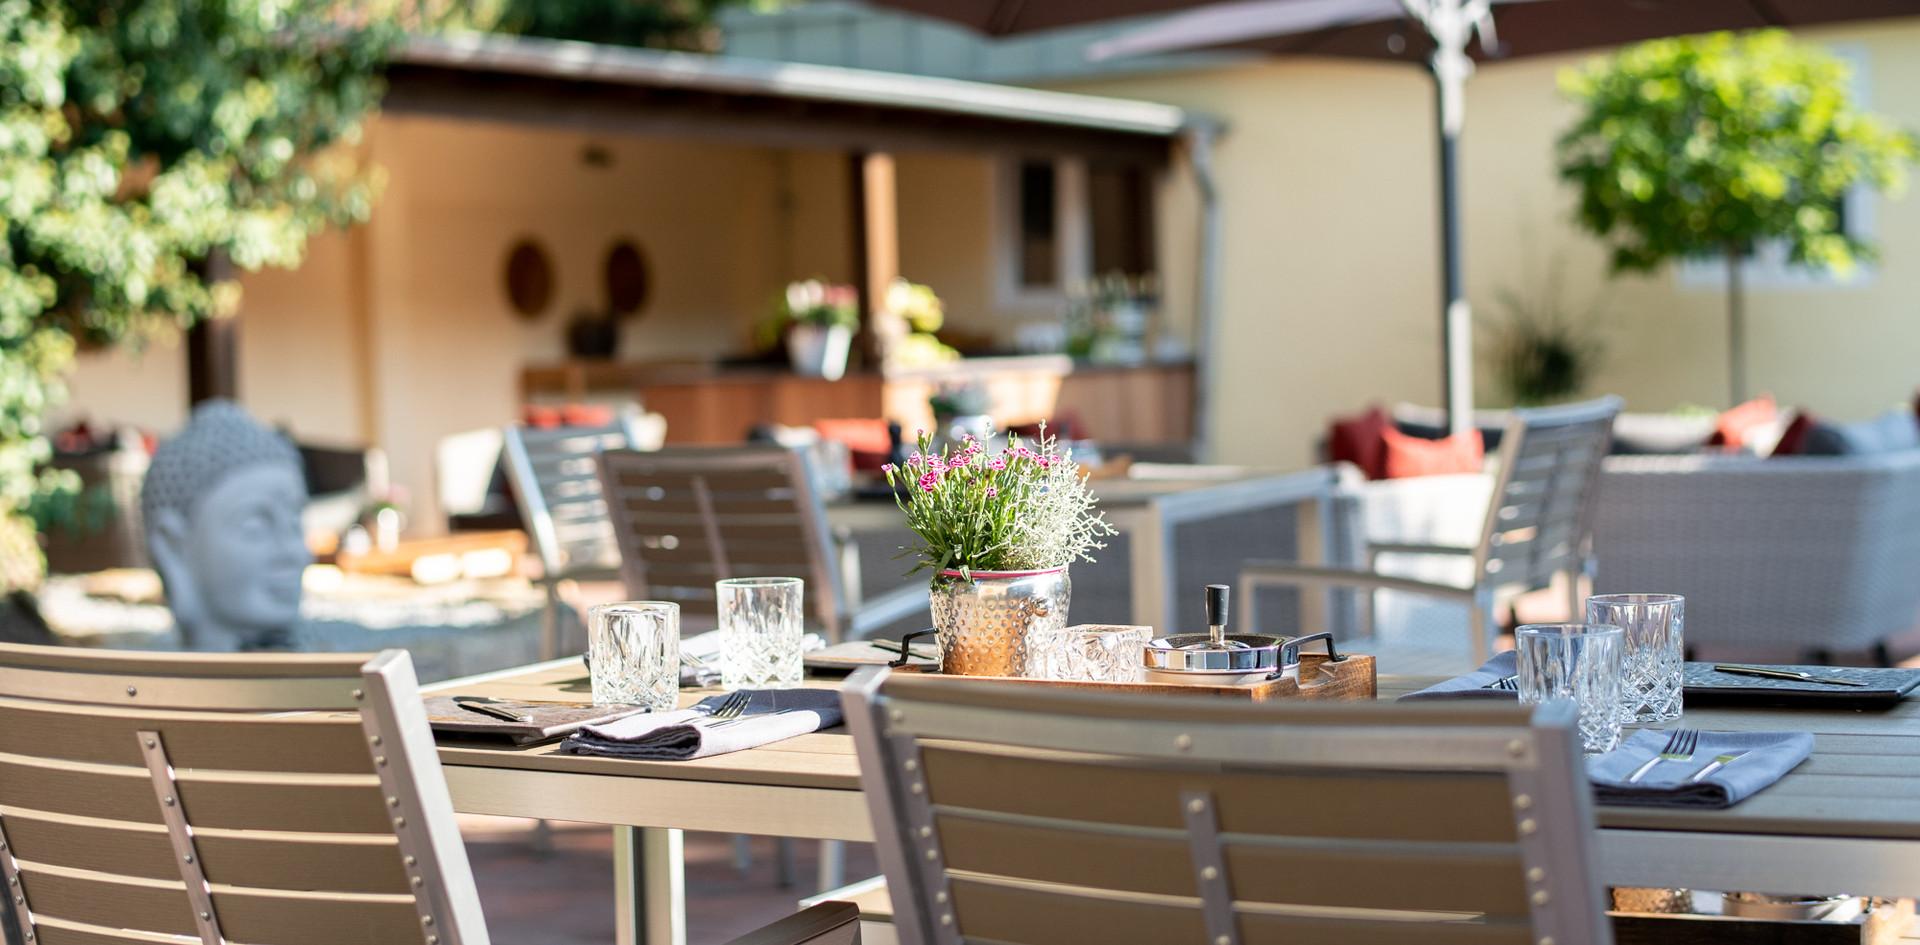 Events Hotelgarten Hotel Wegner - the culinary art hotel